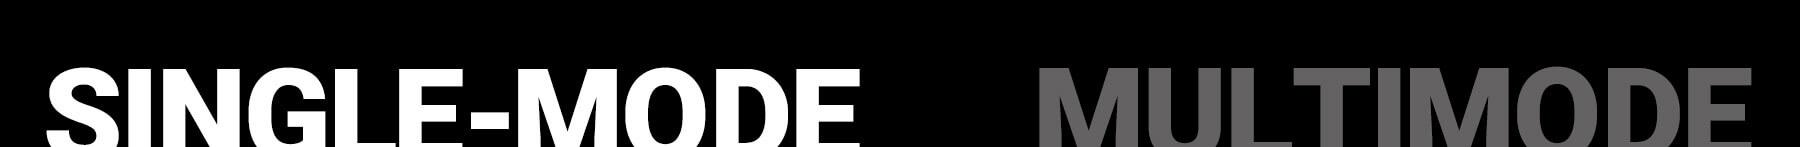 single-mode white text black back